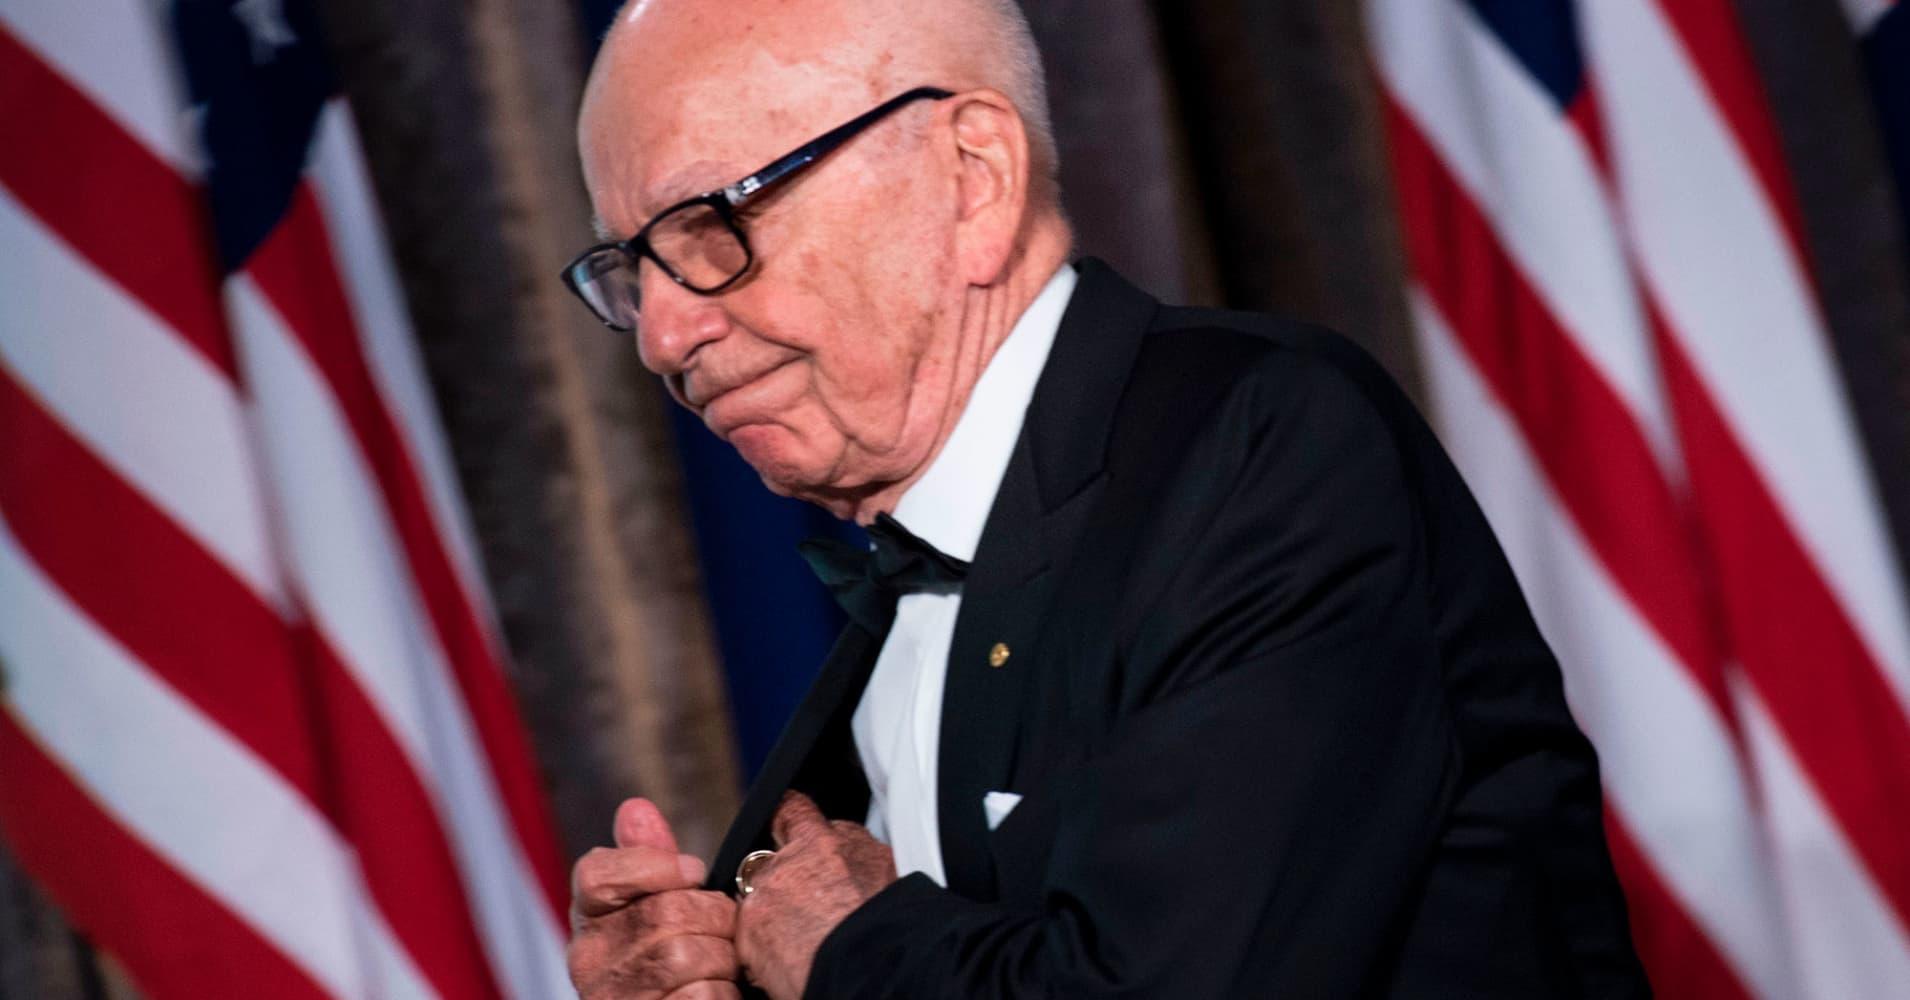 Rupert Murdoch may buy back Fox Sports Networks from Disney